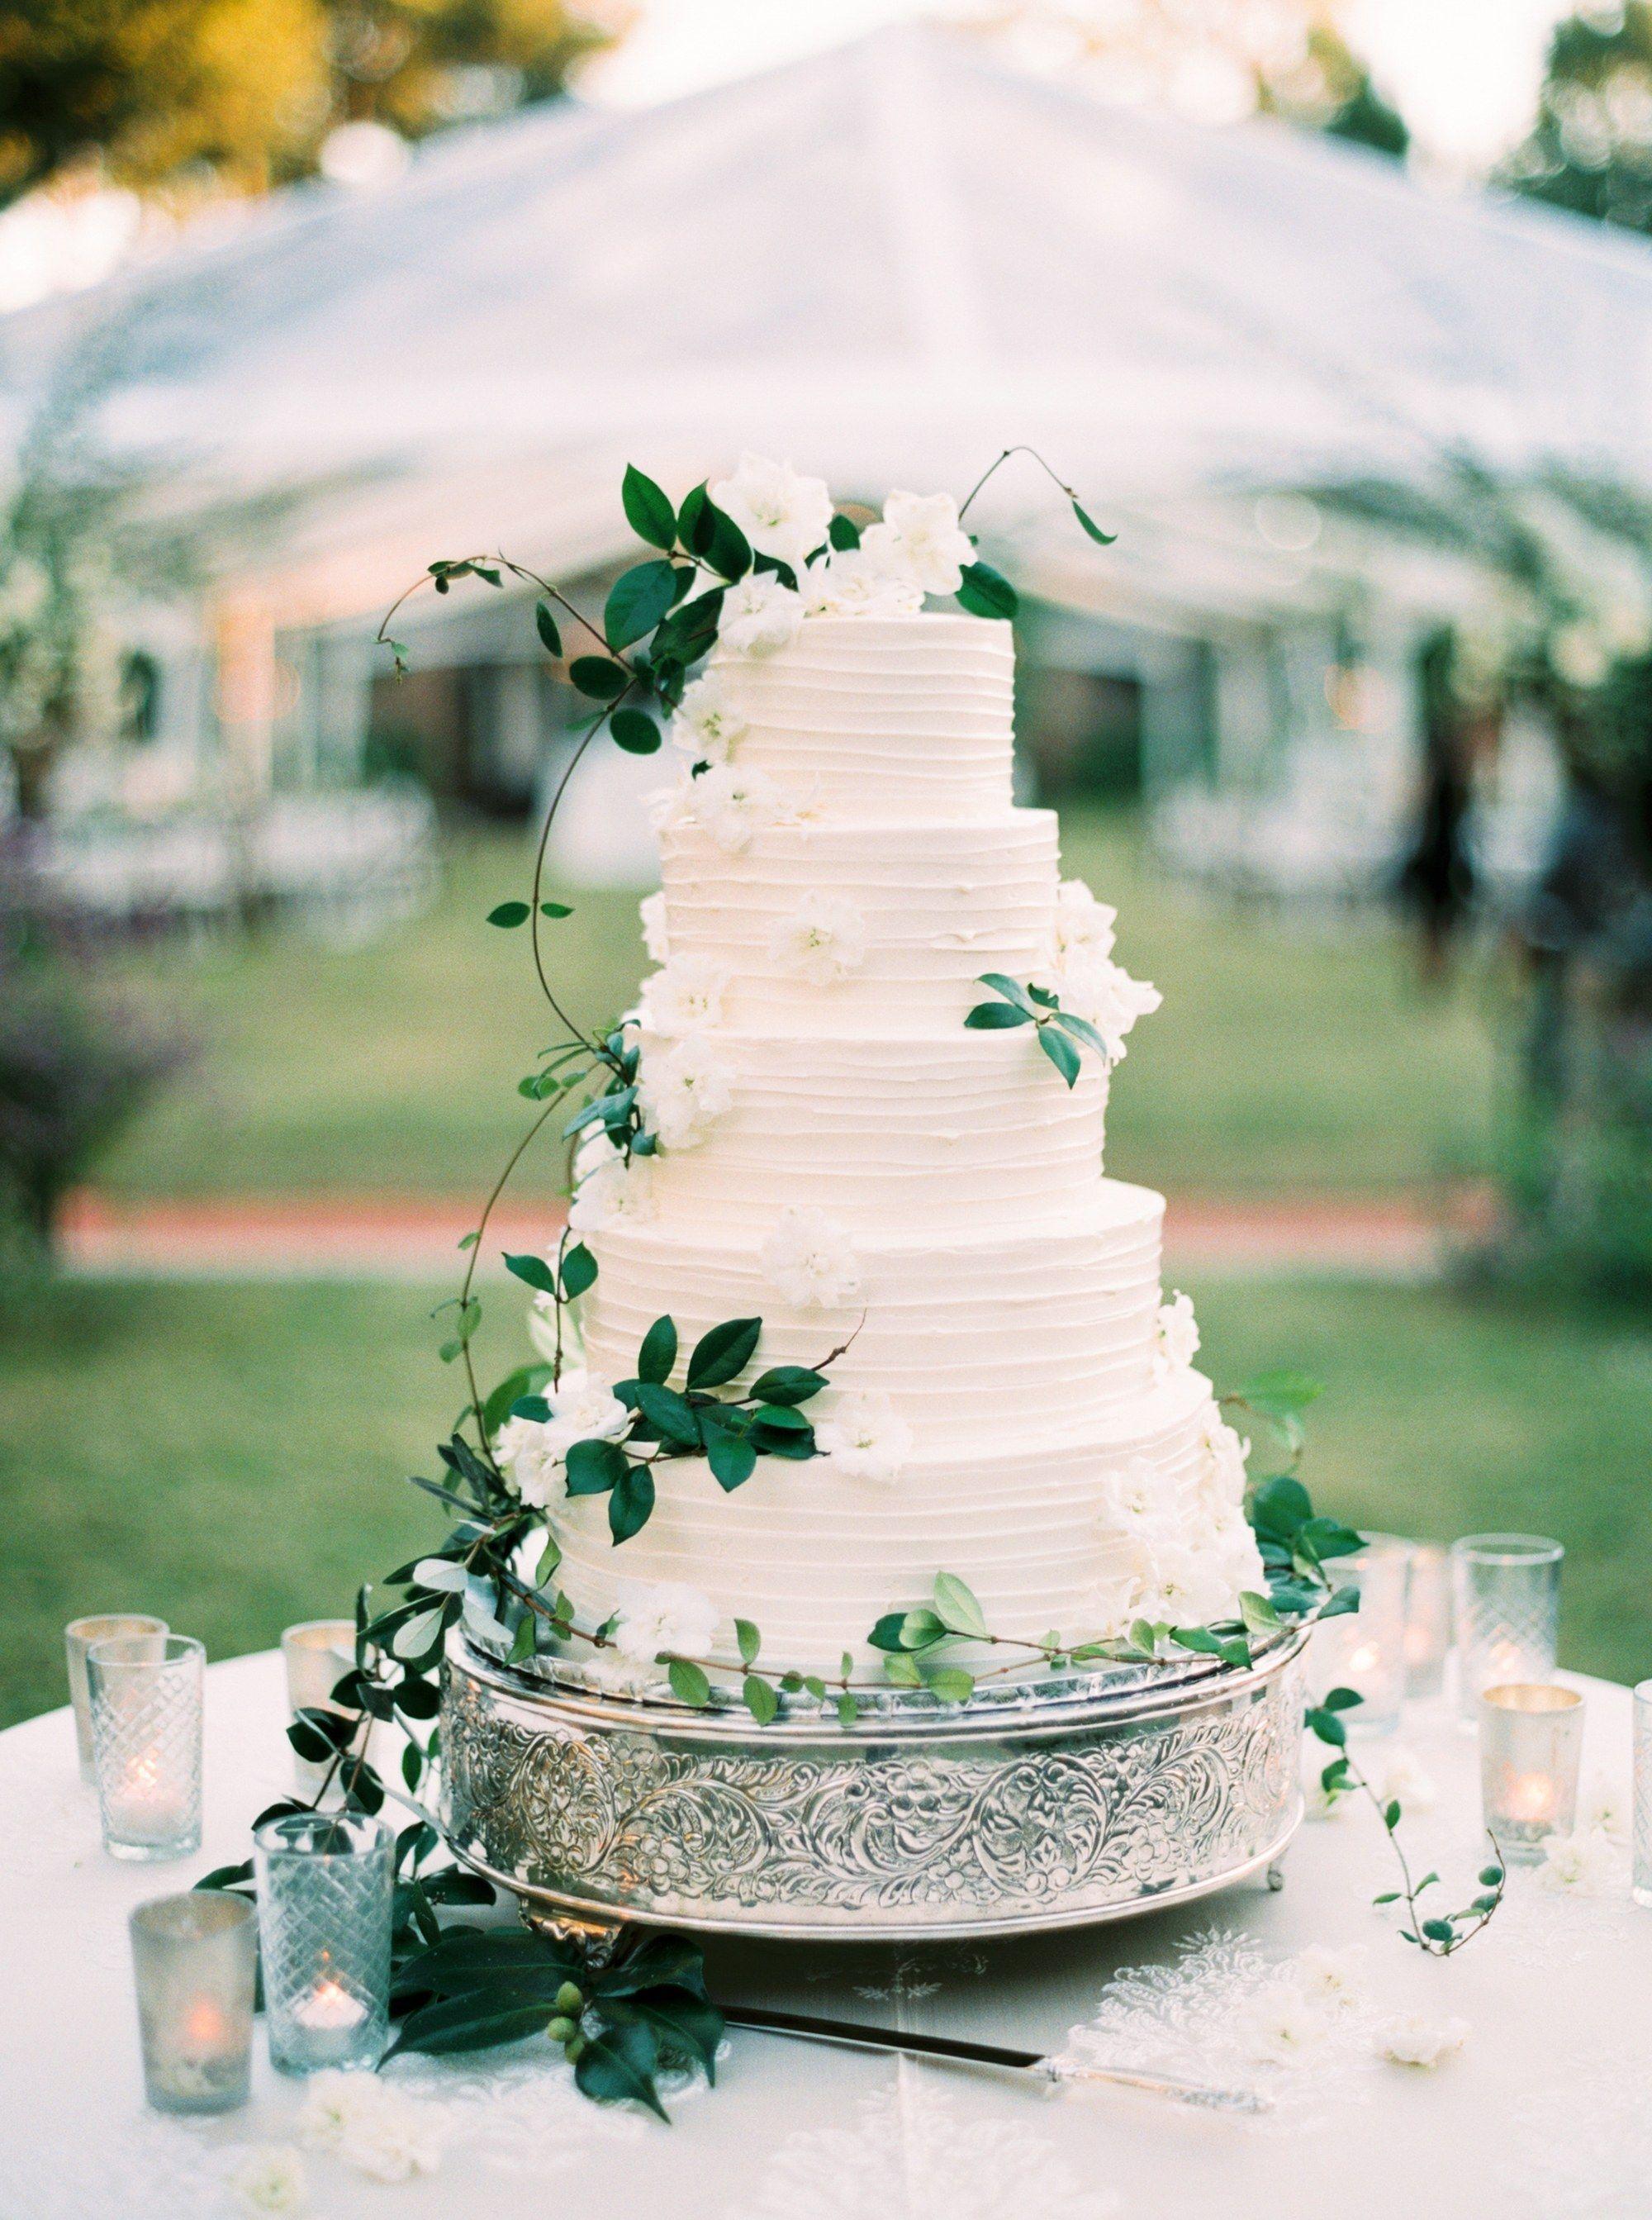 La Tavola Fine Linen Al Girard Ivory Photography Greer Gattuso Wedding Planning An Gle Events Fls Intertwine